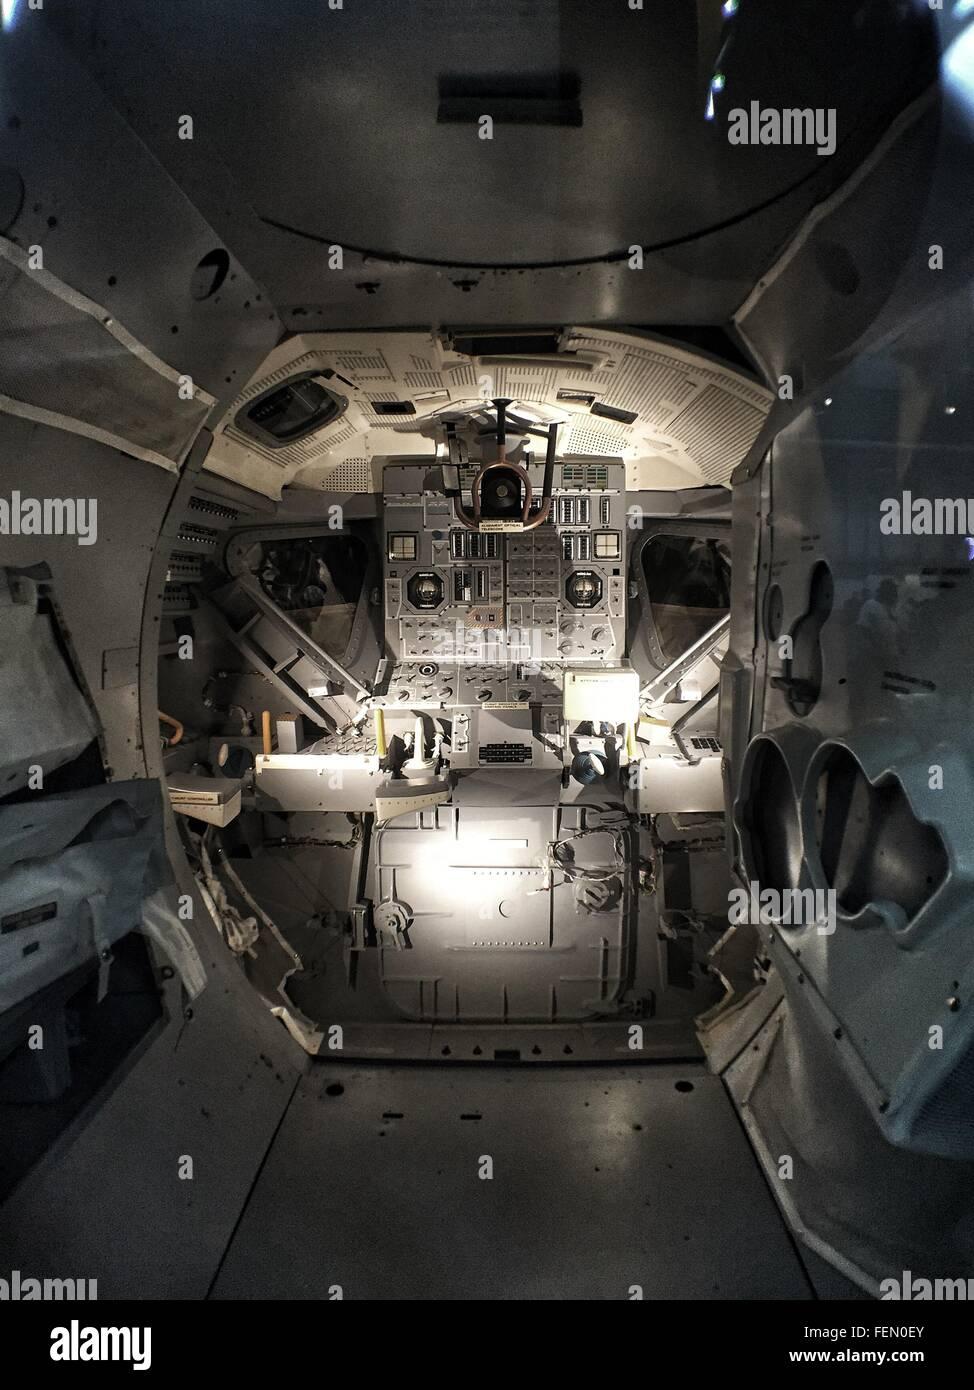 space shuttle columbia inside - photo #46